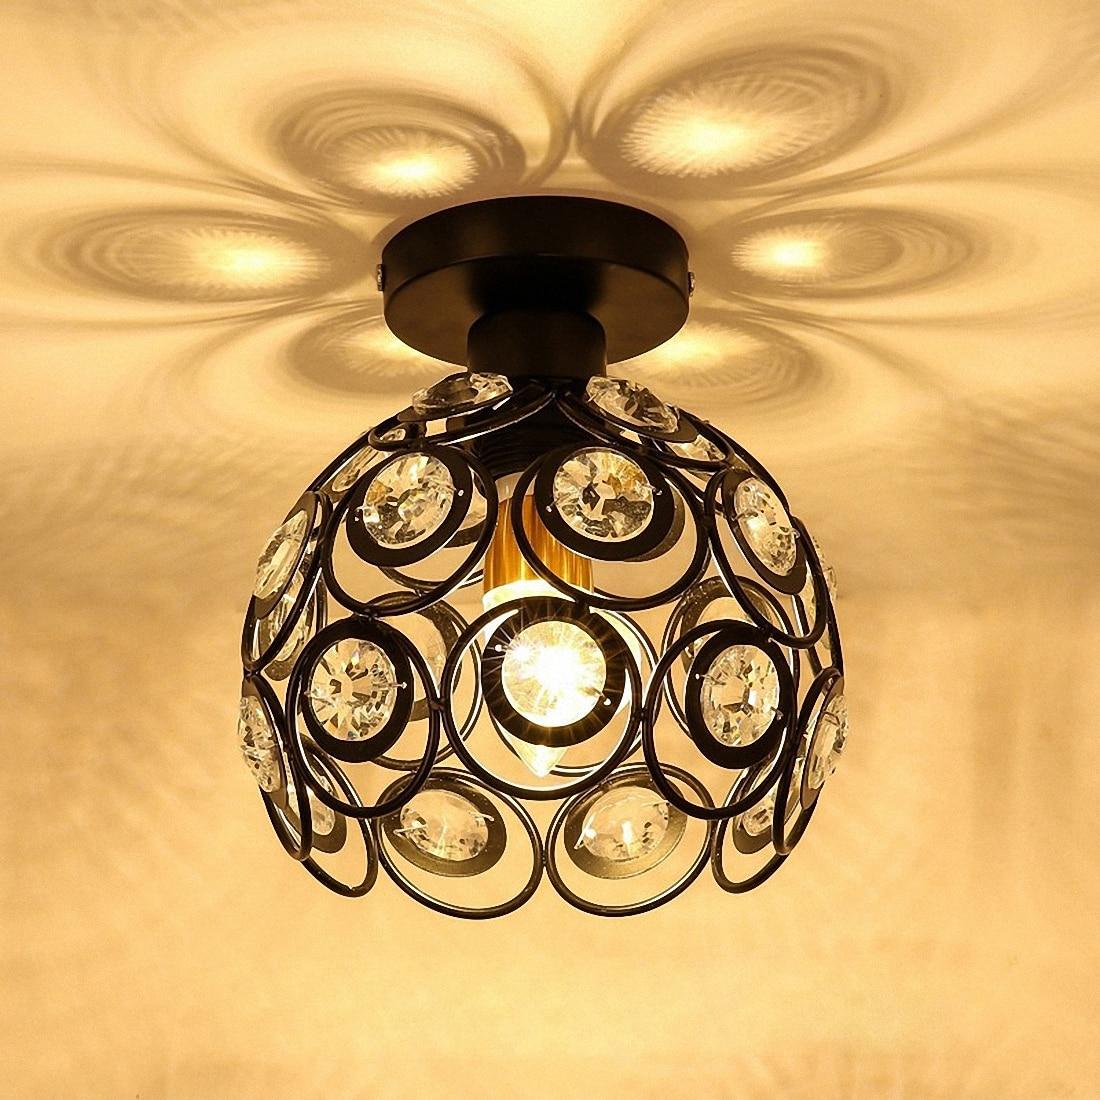 HTB1oLZ.cUR1BeNjy0Fmq6z0wVXaX E27 black Creative crystal minimalist ceiling light Single wall ceiling lamp bedroom lamp Single European iron lamp Crystal la